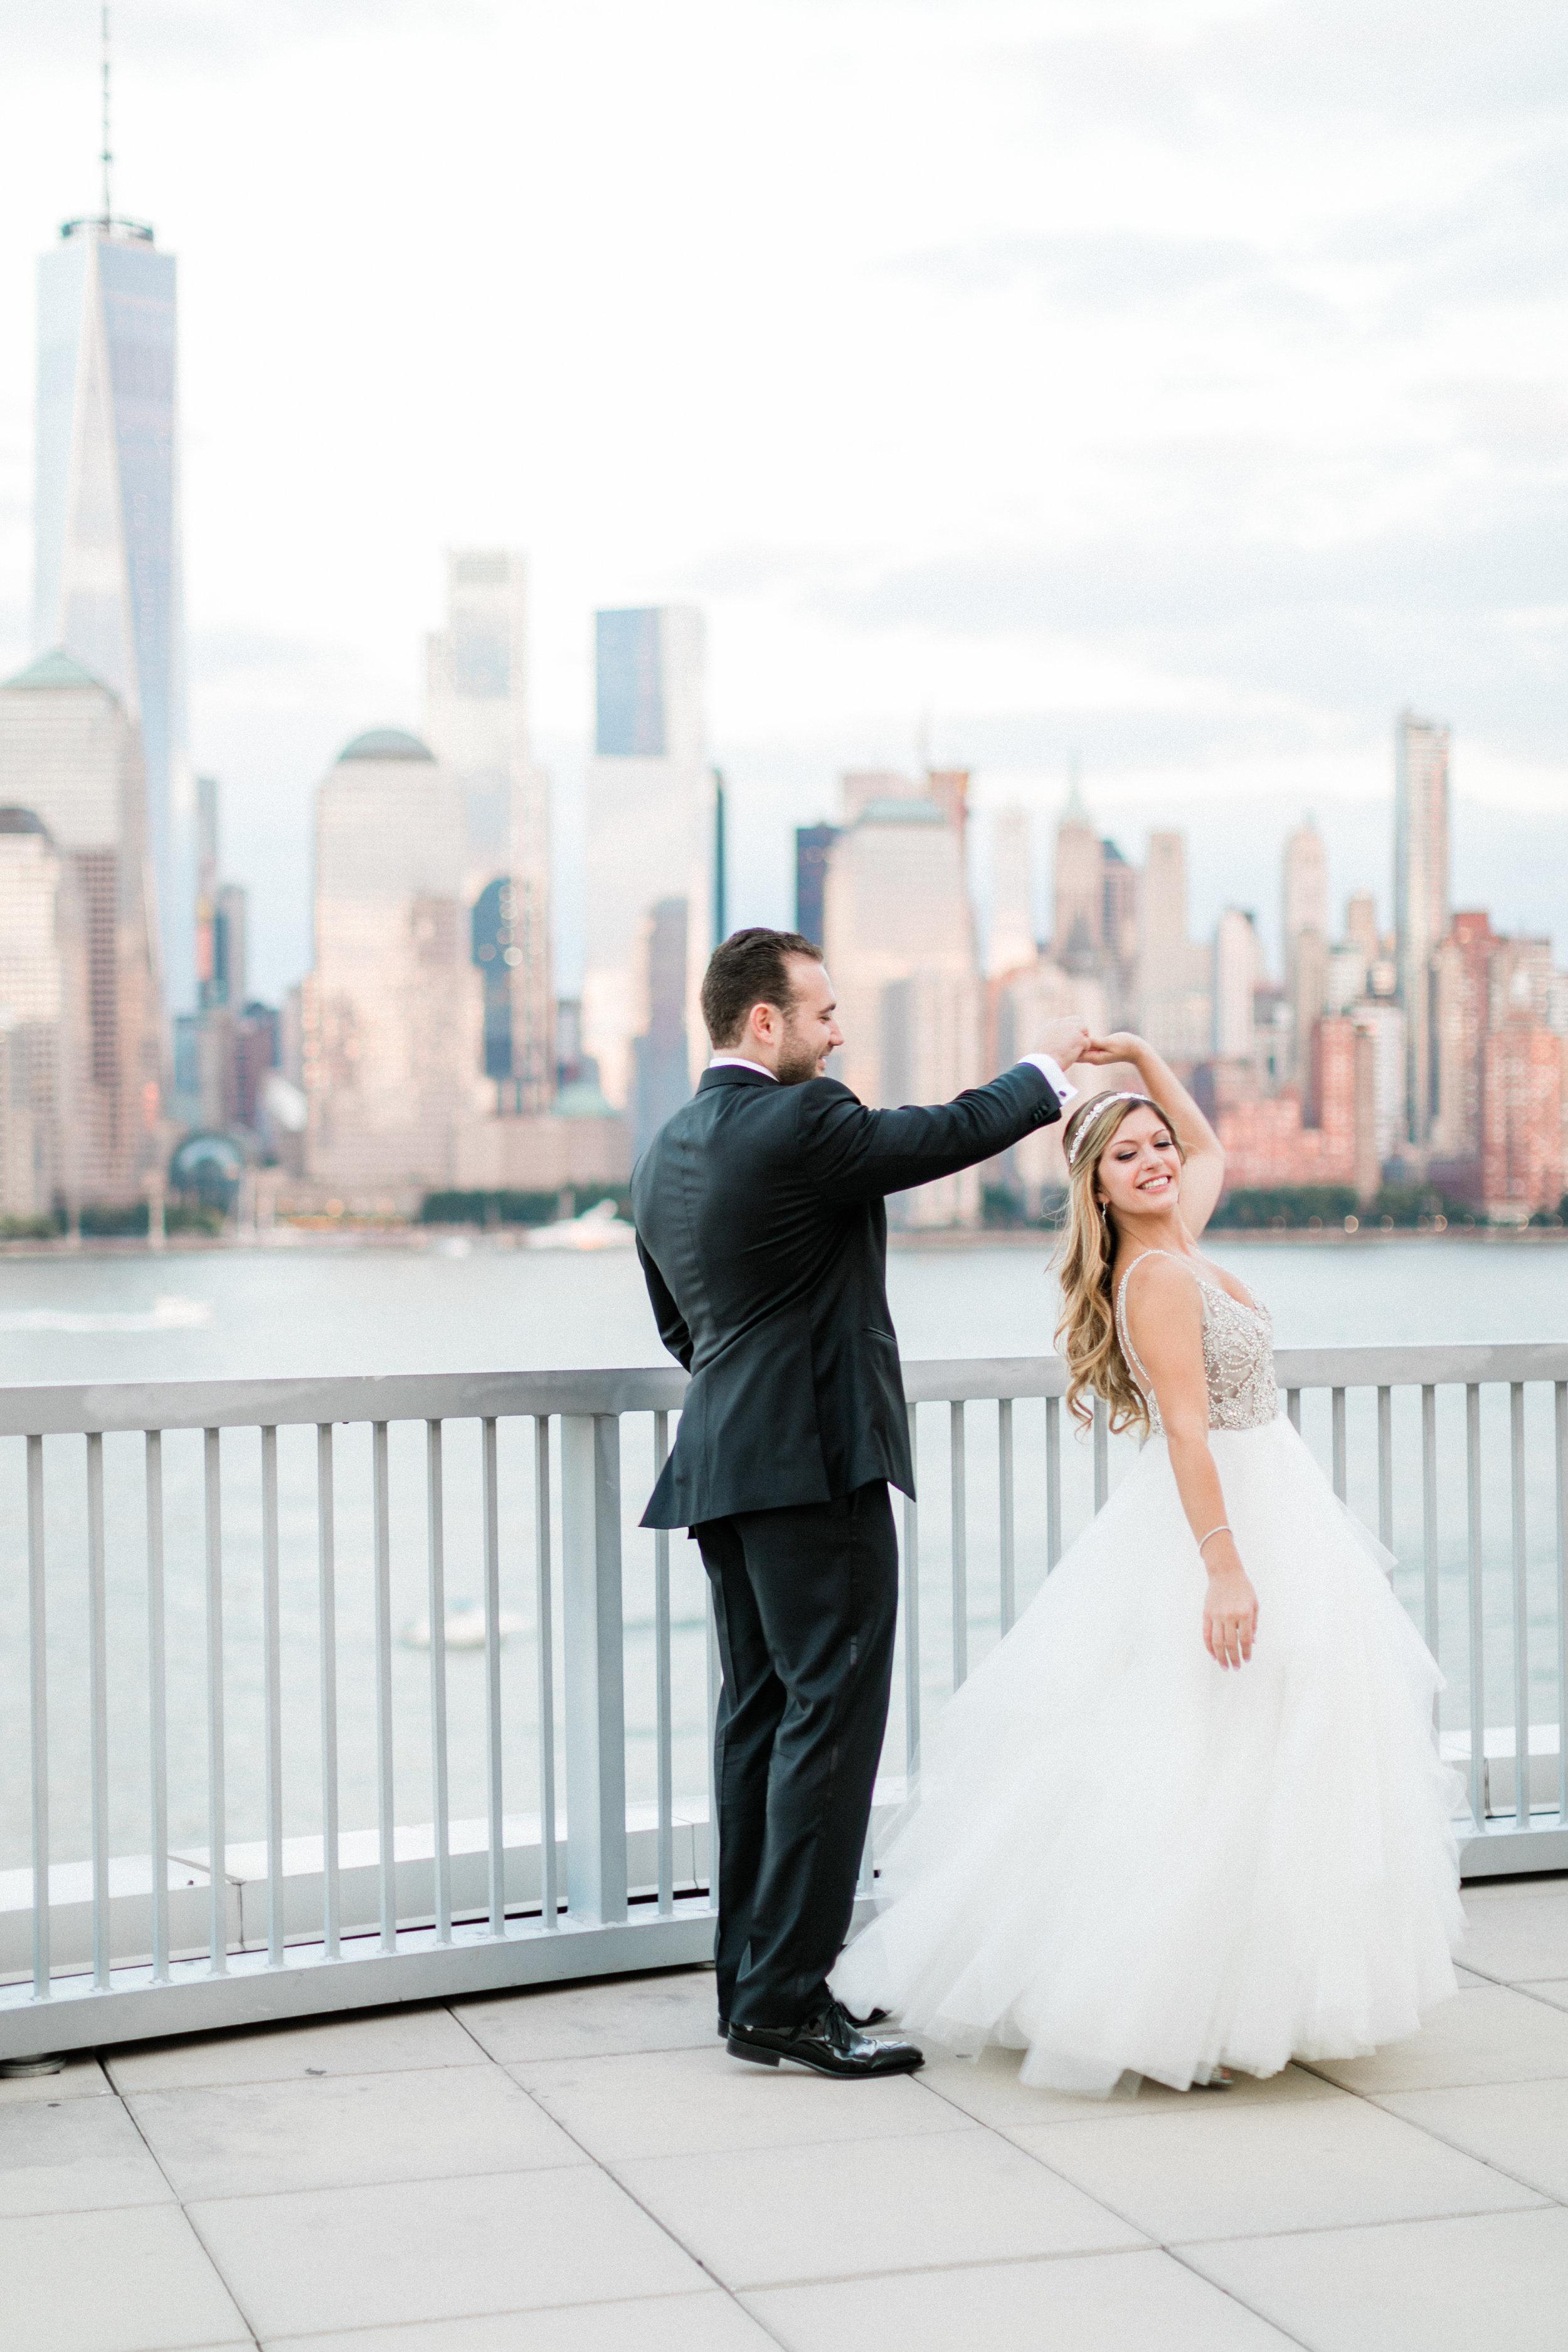 hyatt-regency-jersey-city-wedding-photographer58.jpg